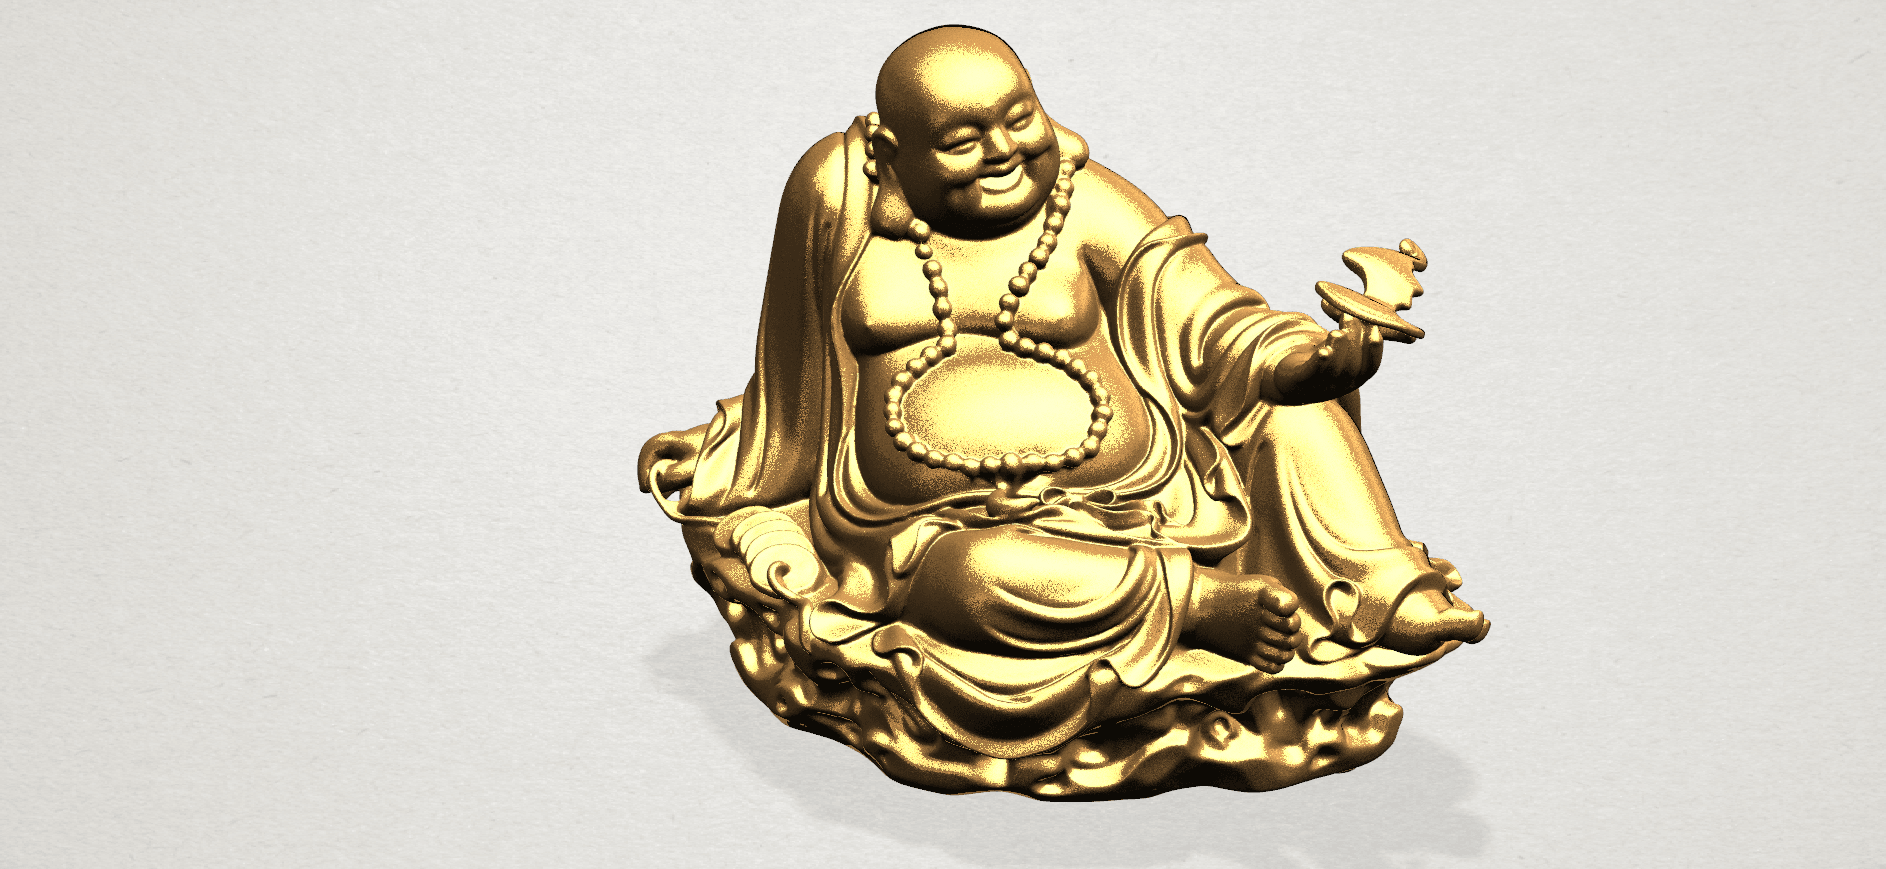 Metteyya Buddha 06 - A07.png Download free STL file Metteyya Buddha 06 • 3D print model, GeorgesNikkei